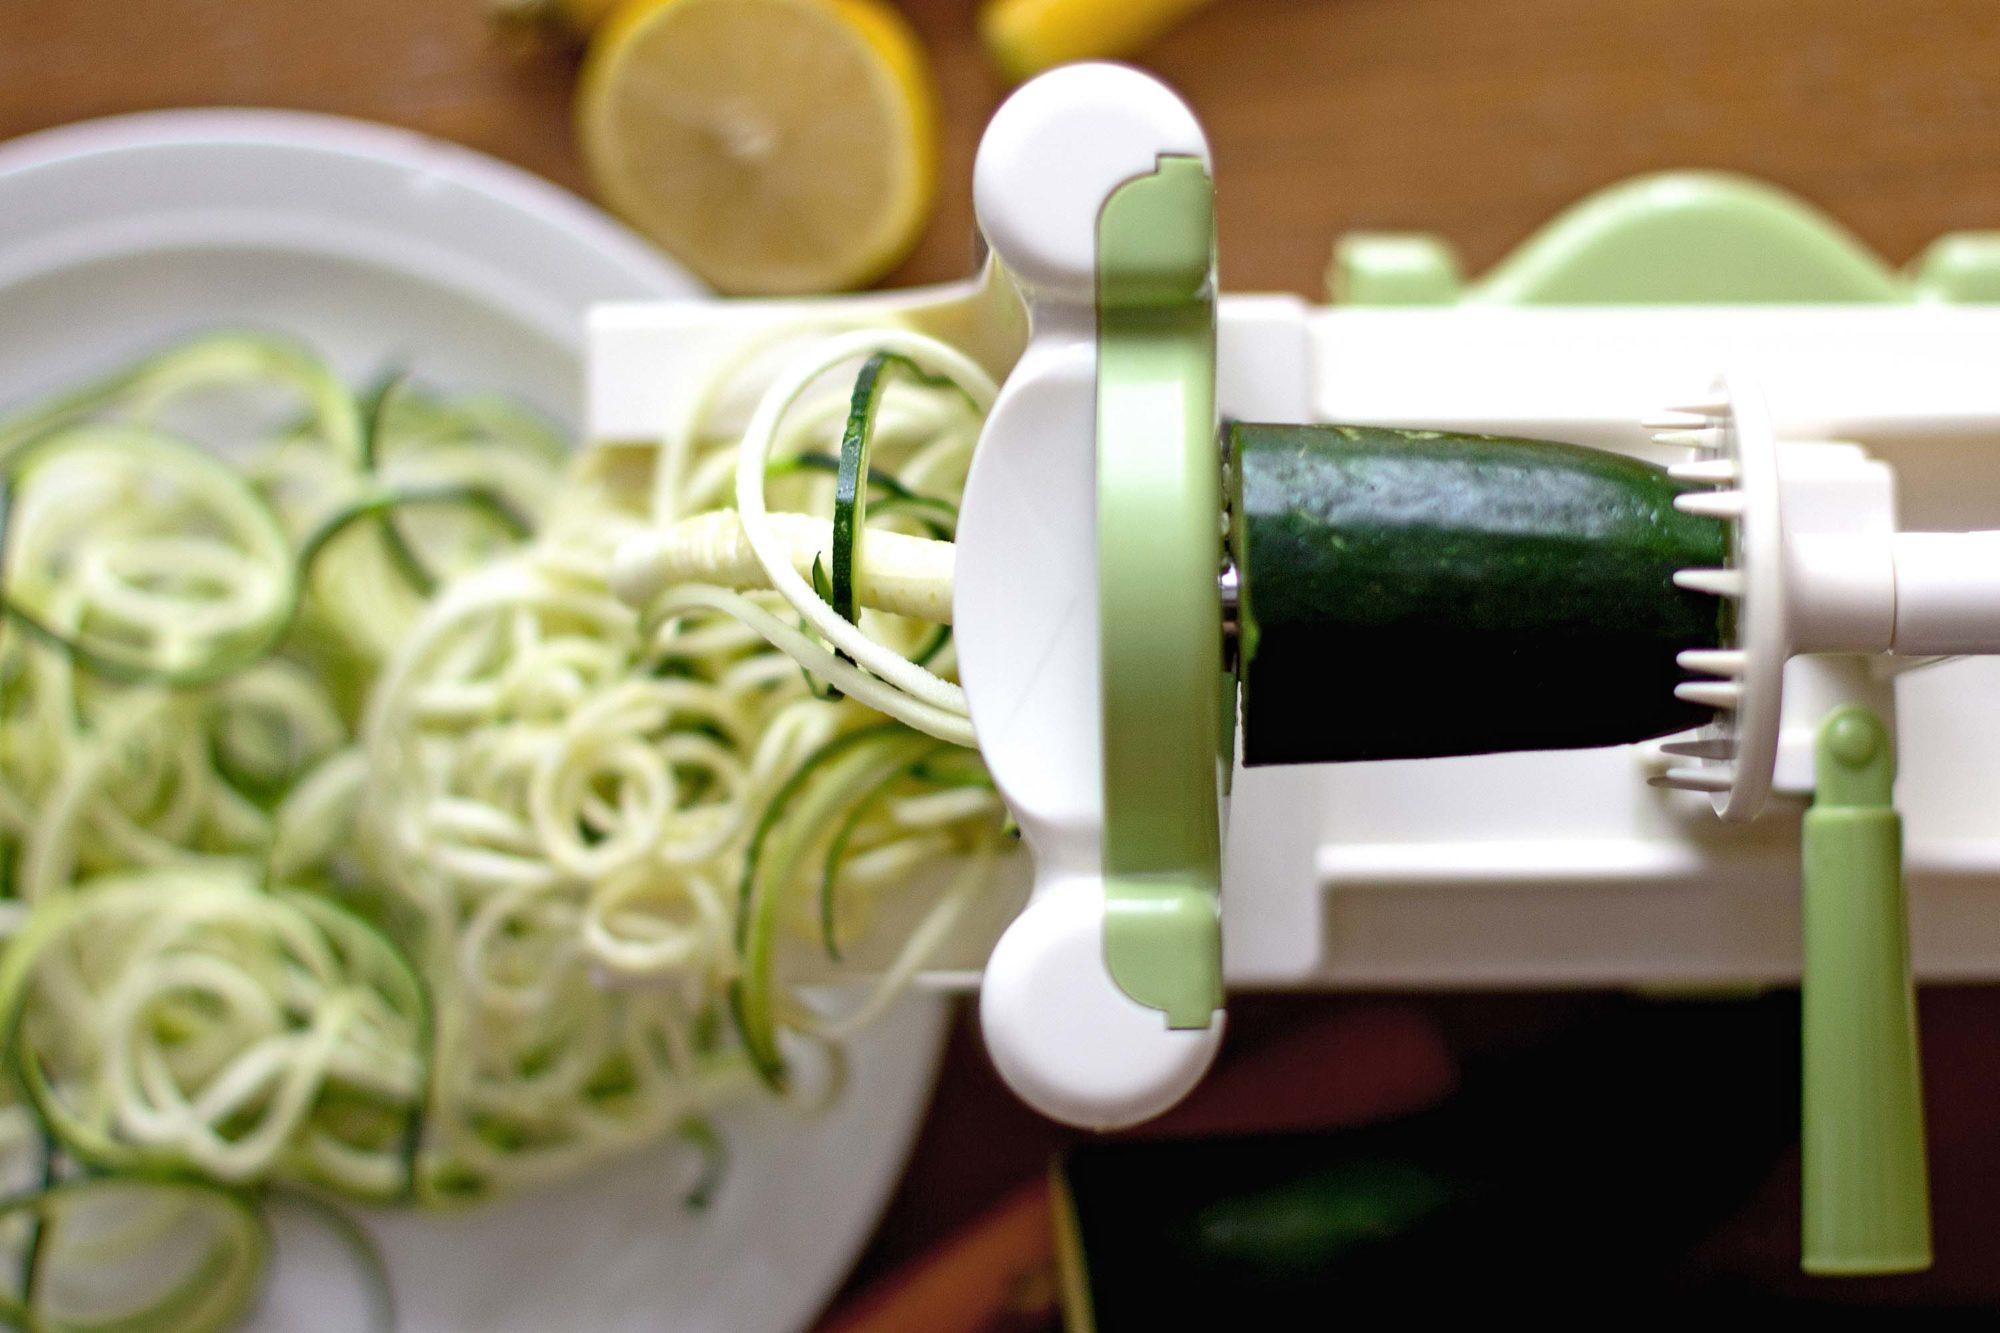 vegan zucchininudeln zucchini zoodles rezept roh vegan gluten frei